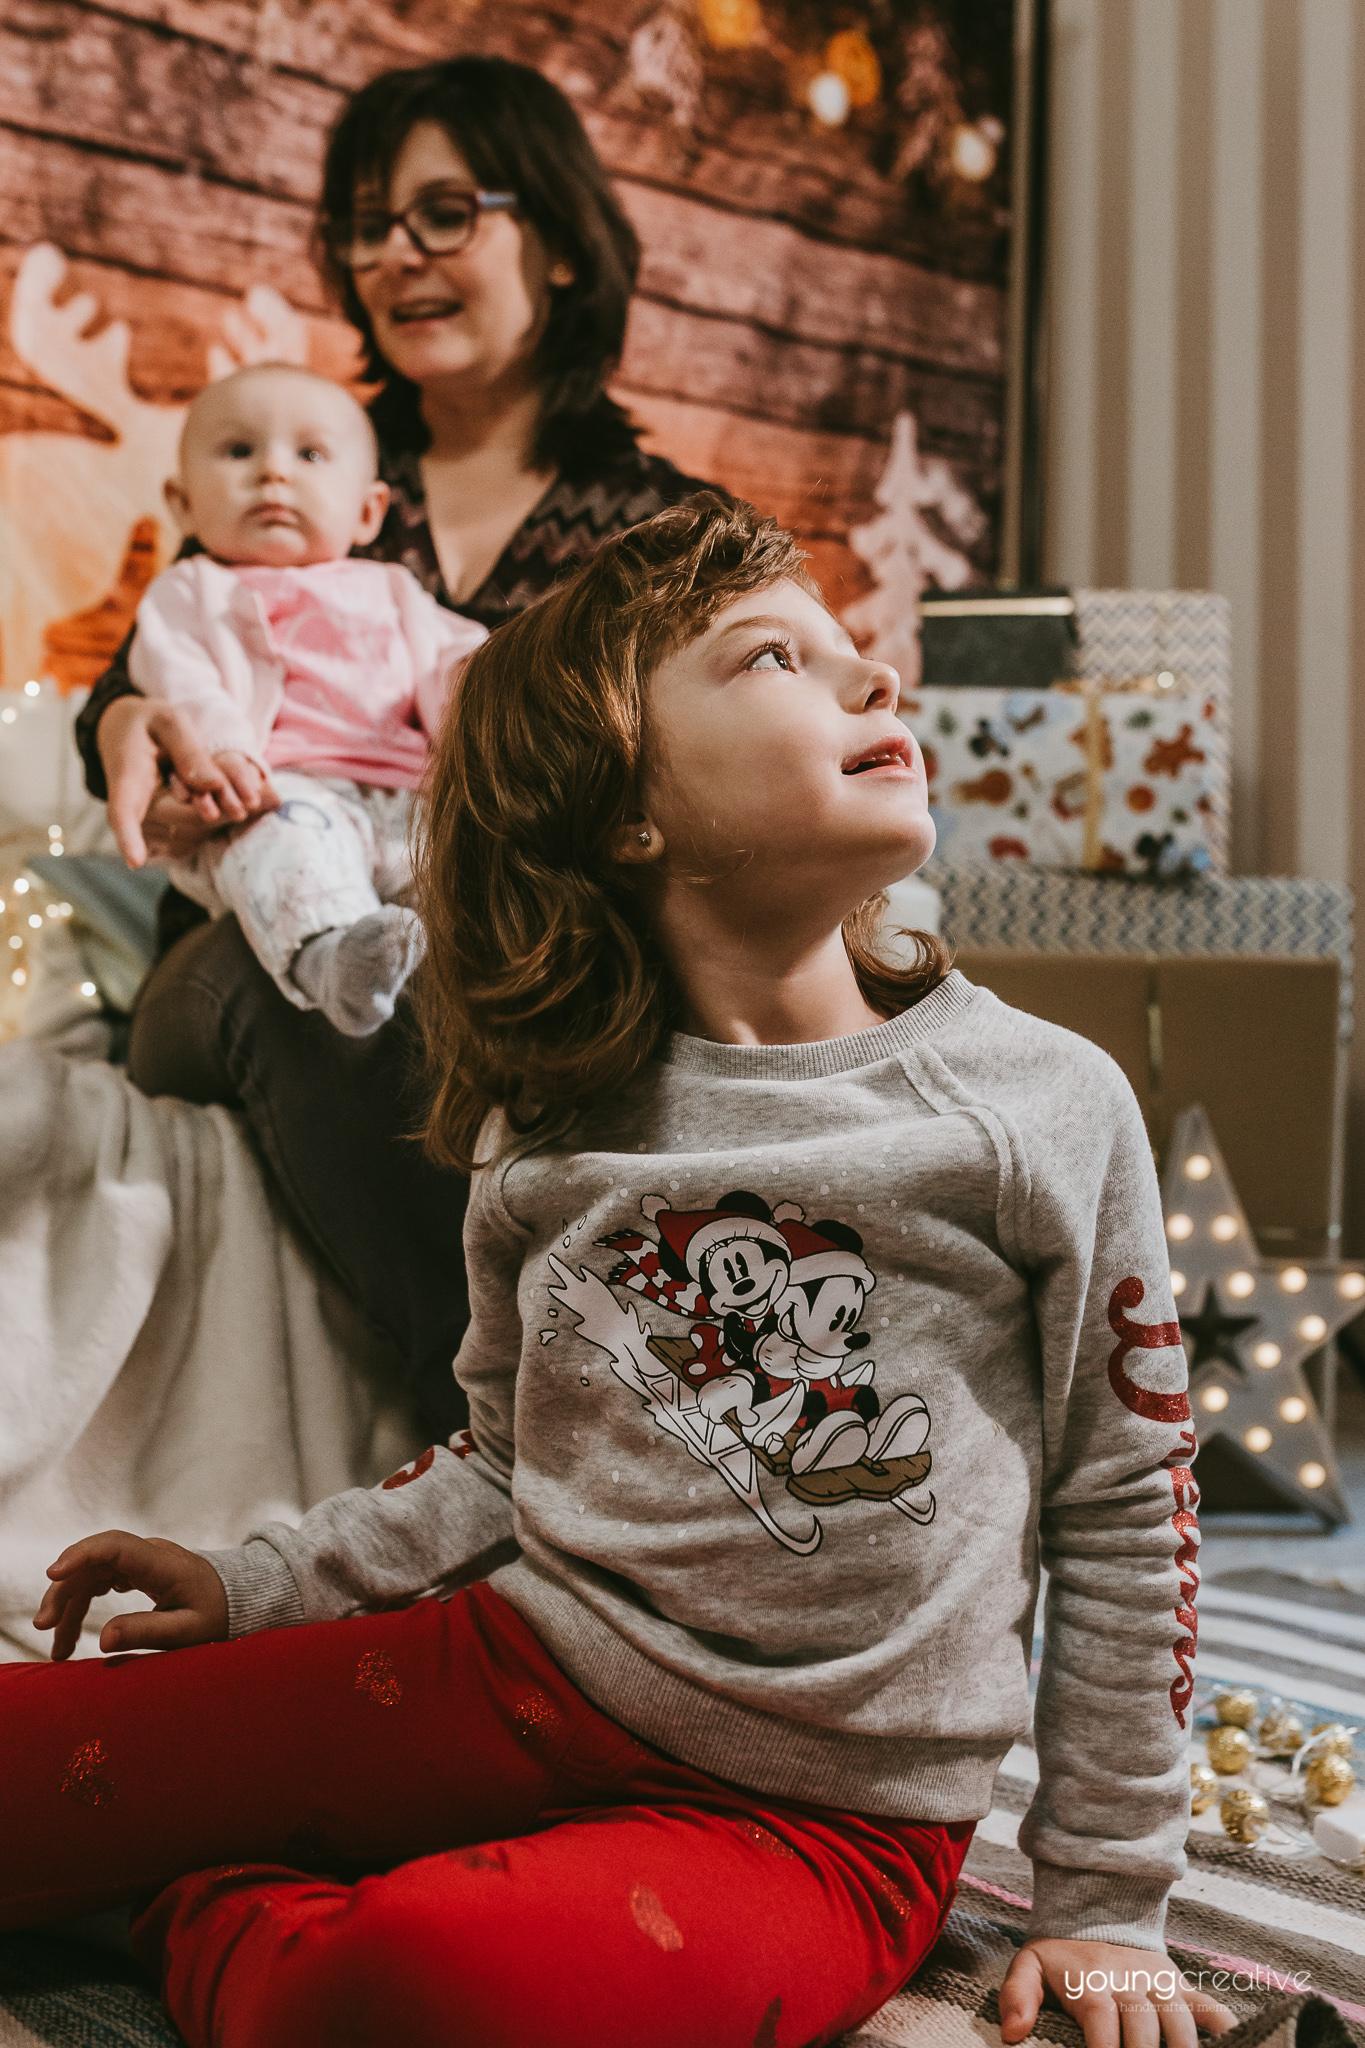 Christmas memories 2018 | youngcreative.info media © Dan Filipciuc, Cristina Bejan